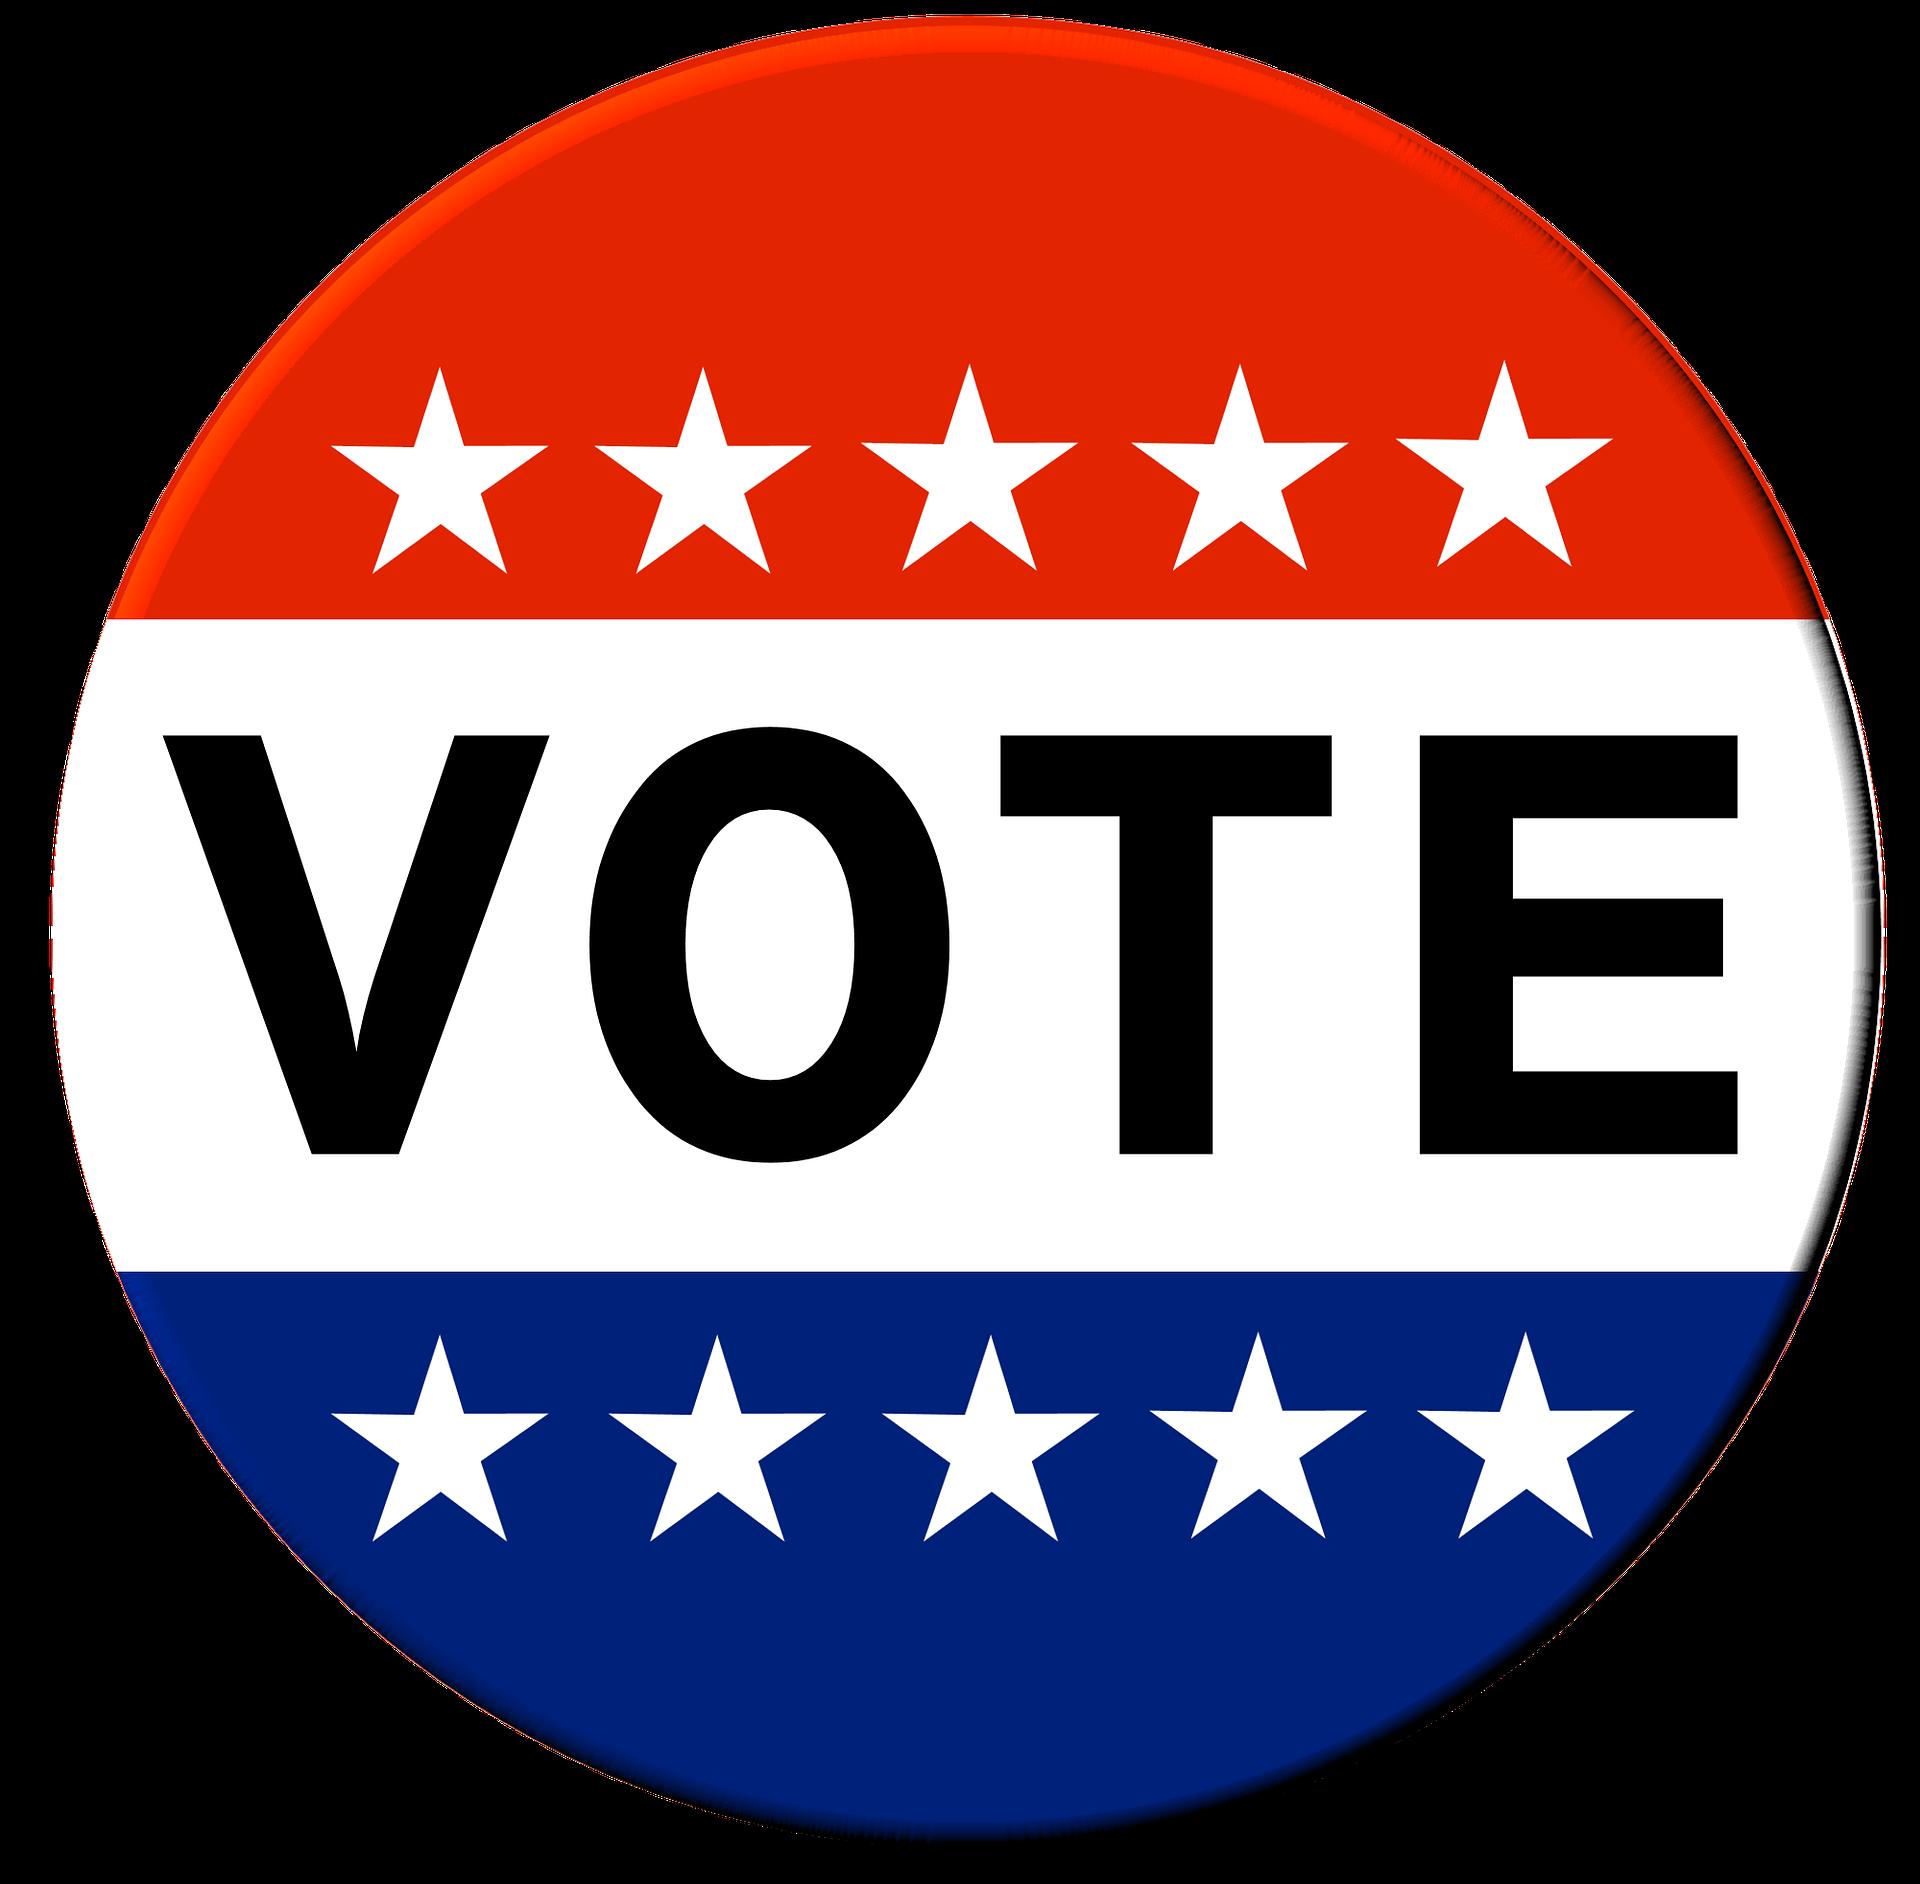 5ad4f20b-ca2d-11ea-a3d0-06b4694bee2a%2F1601054263671-Vote.png